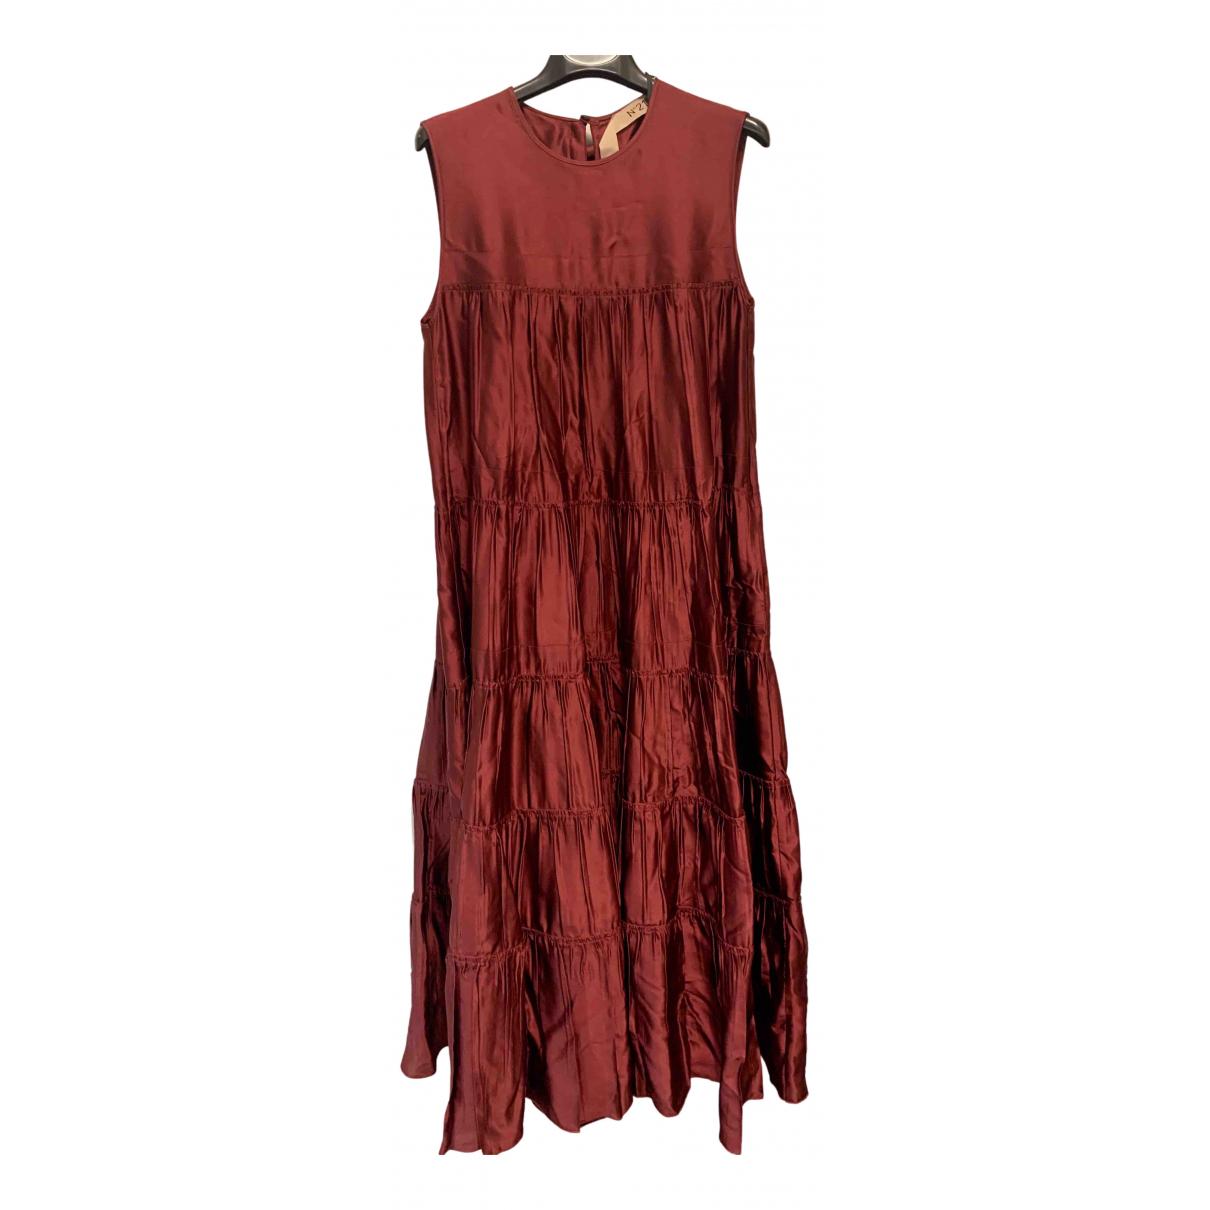 N°21 \N Burgundy dress for Women 40 IT